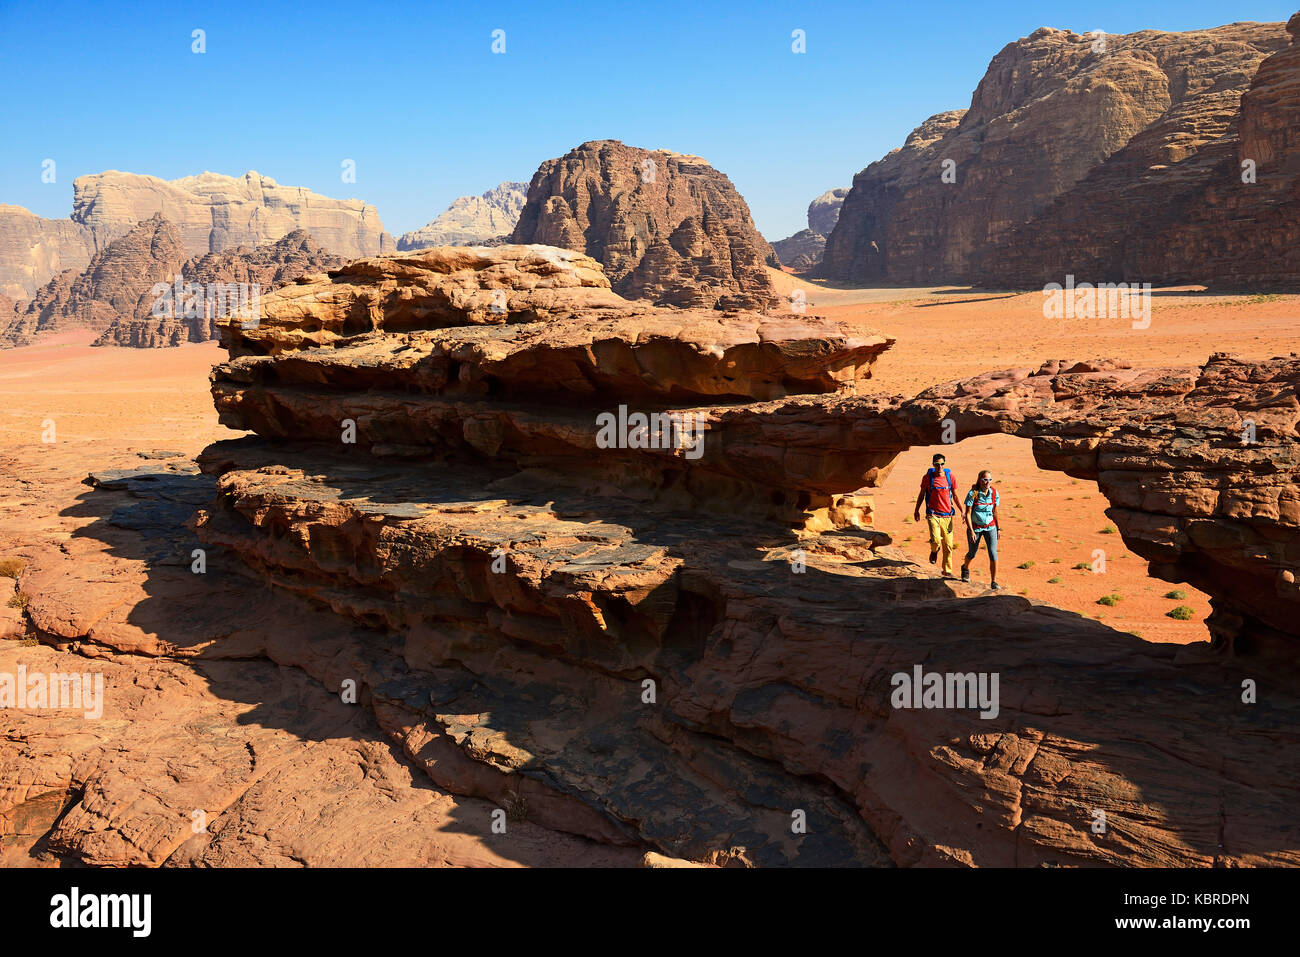 Paar Wandern am Rock Arch, Al Borg Alsagheer, Wadi Rum, Jordanien Stockbild